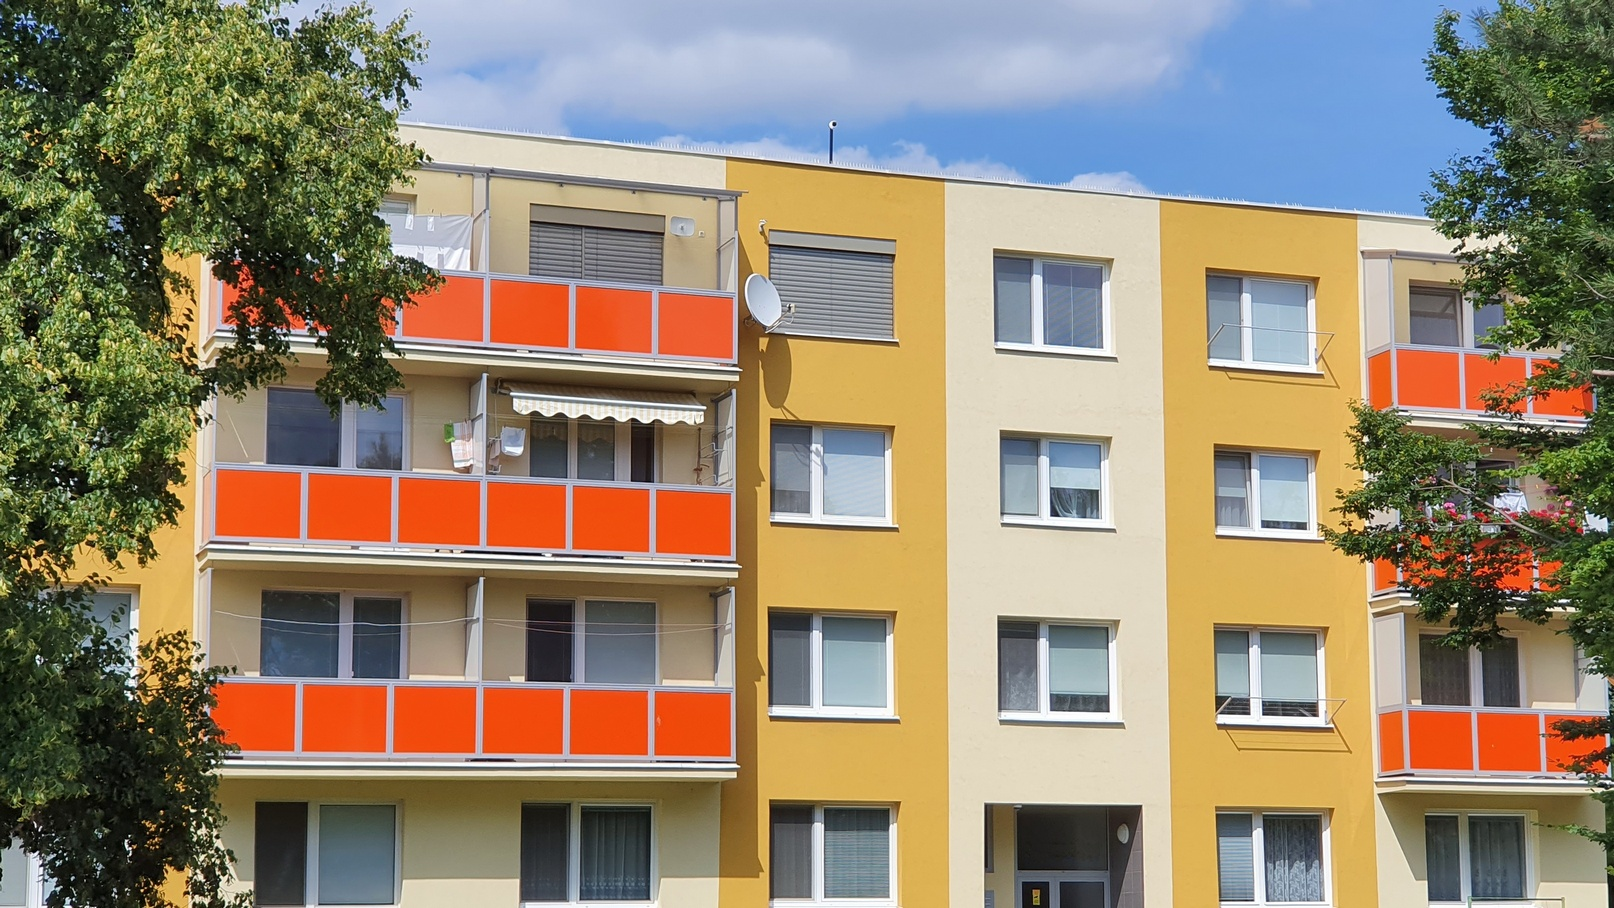 Byt v Nitre, Slovensko